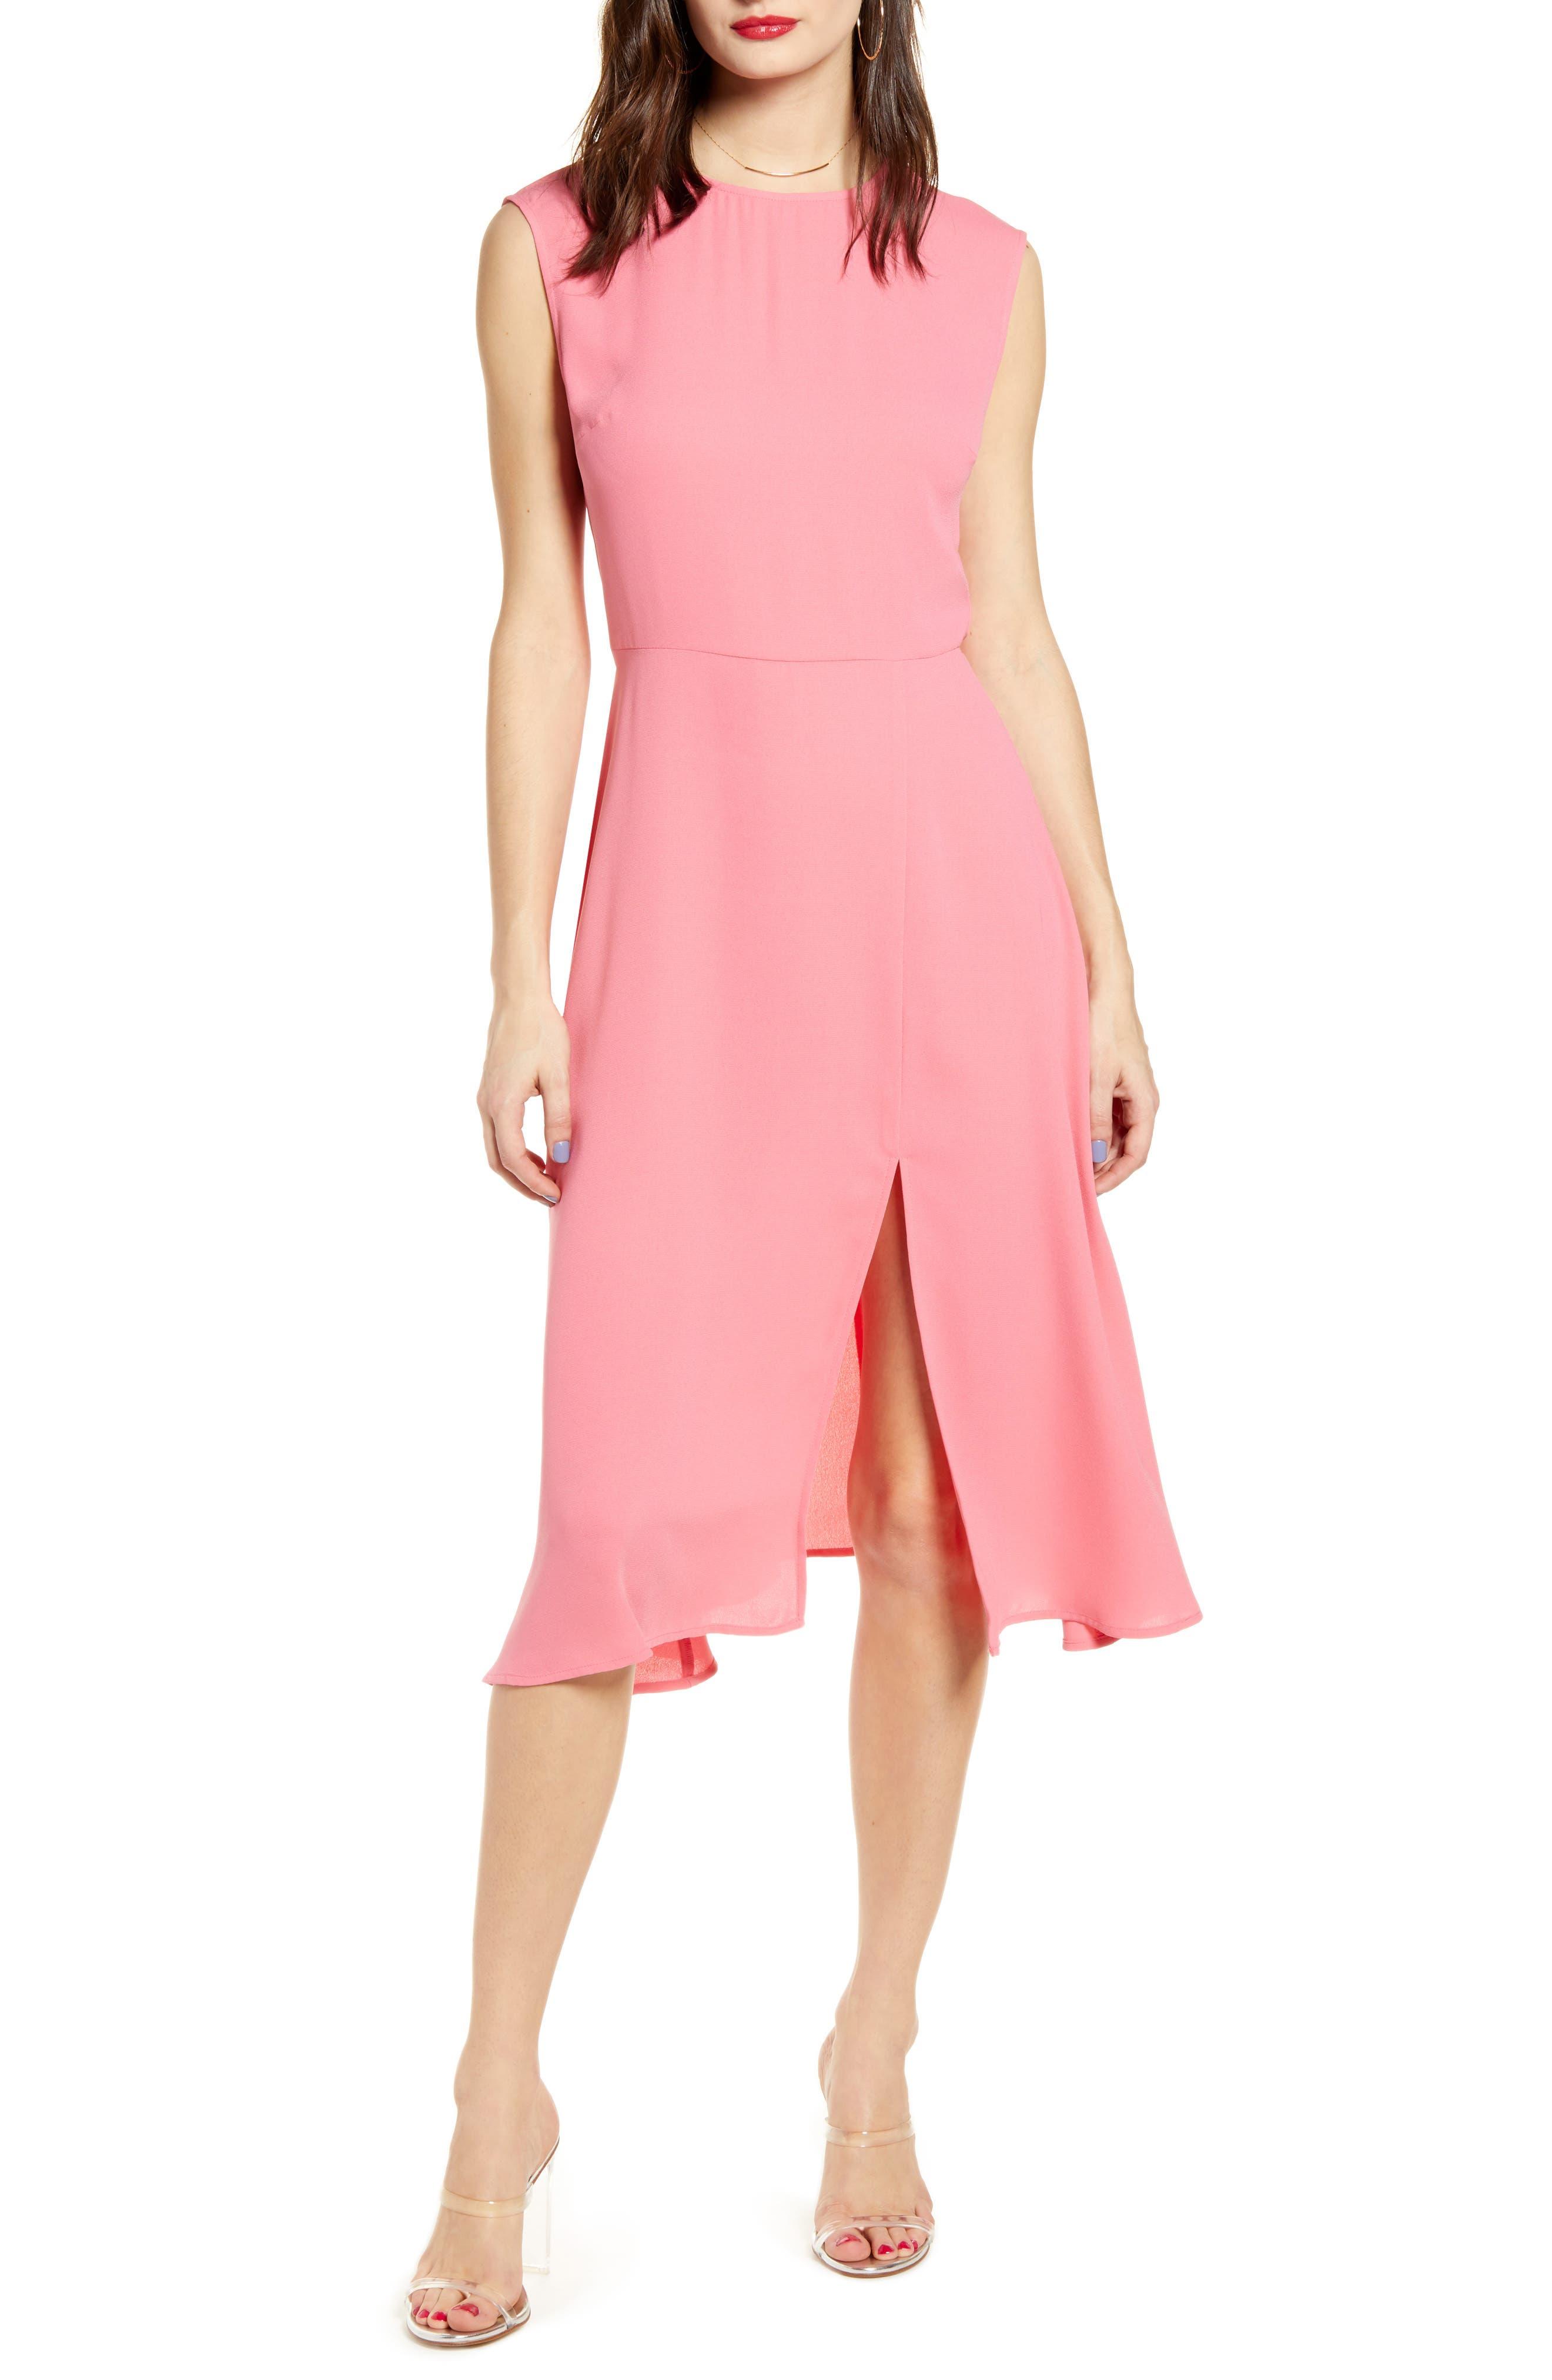 Leith Chic Midi Dress, Pink